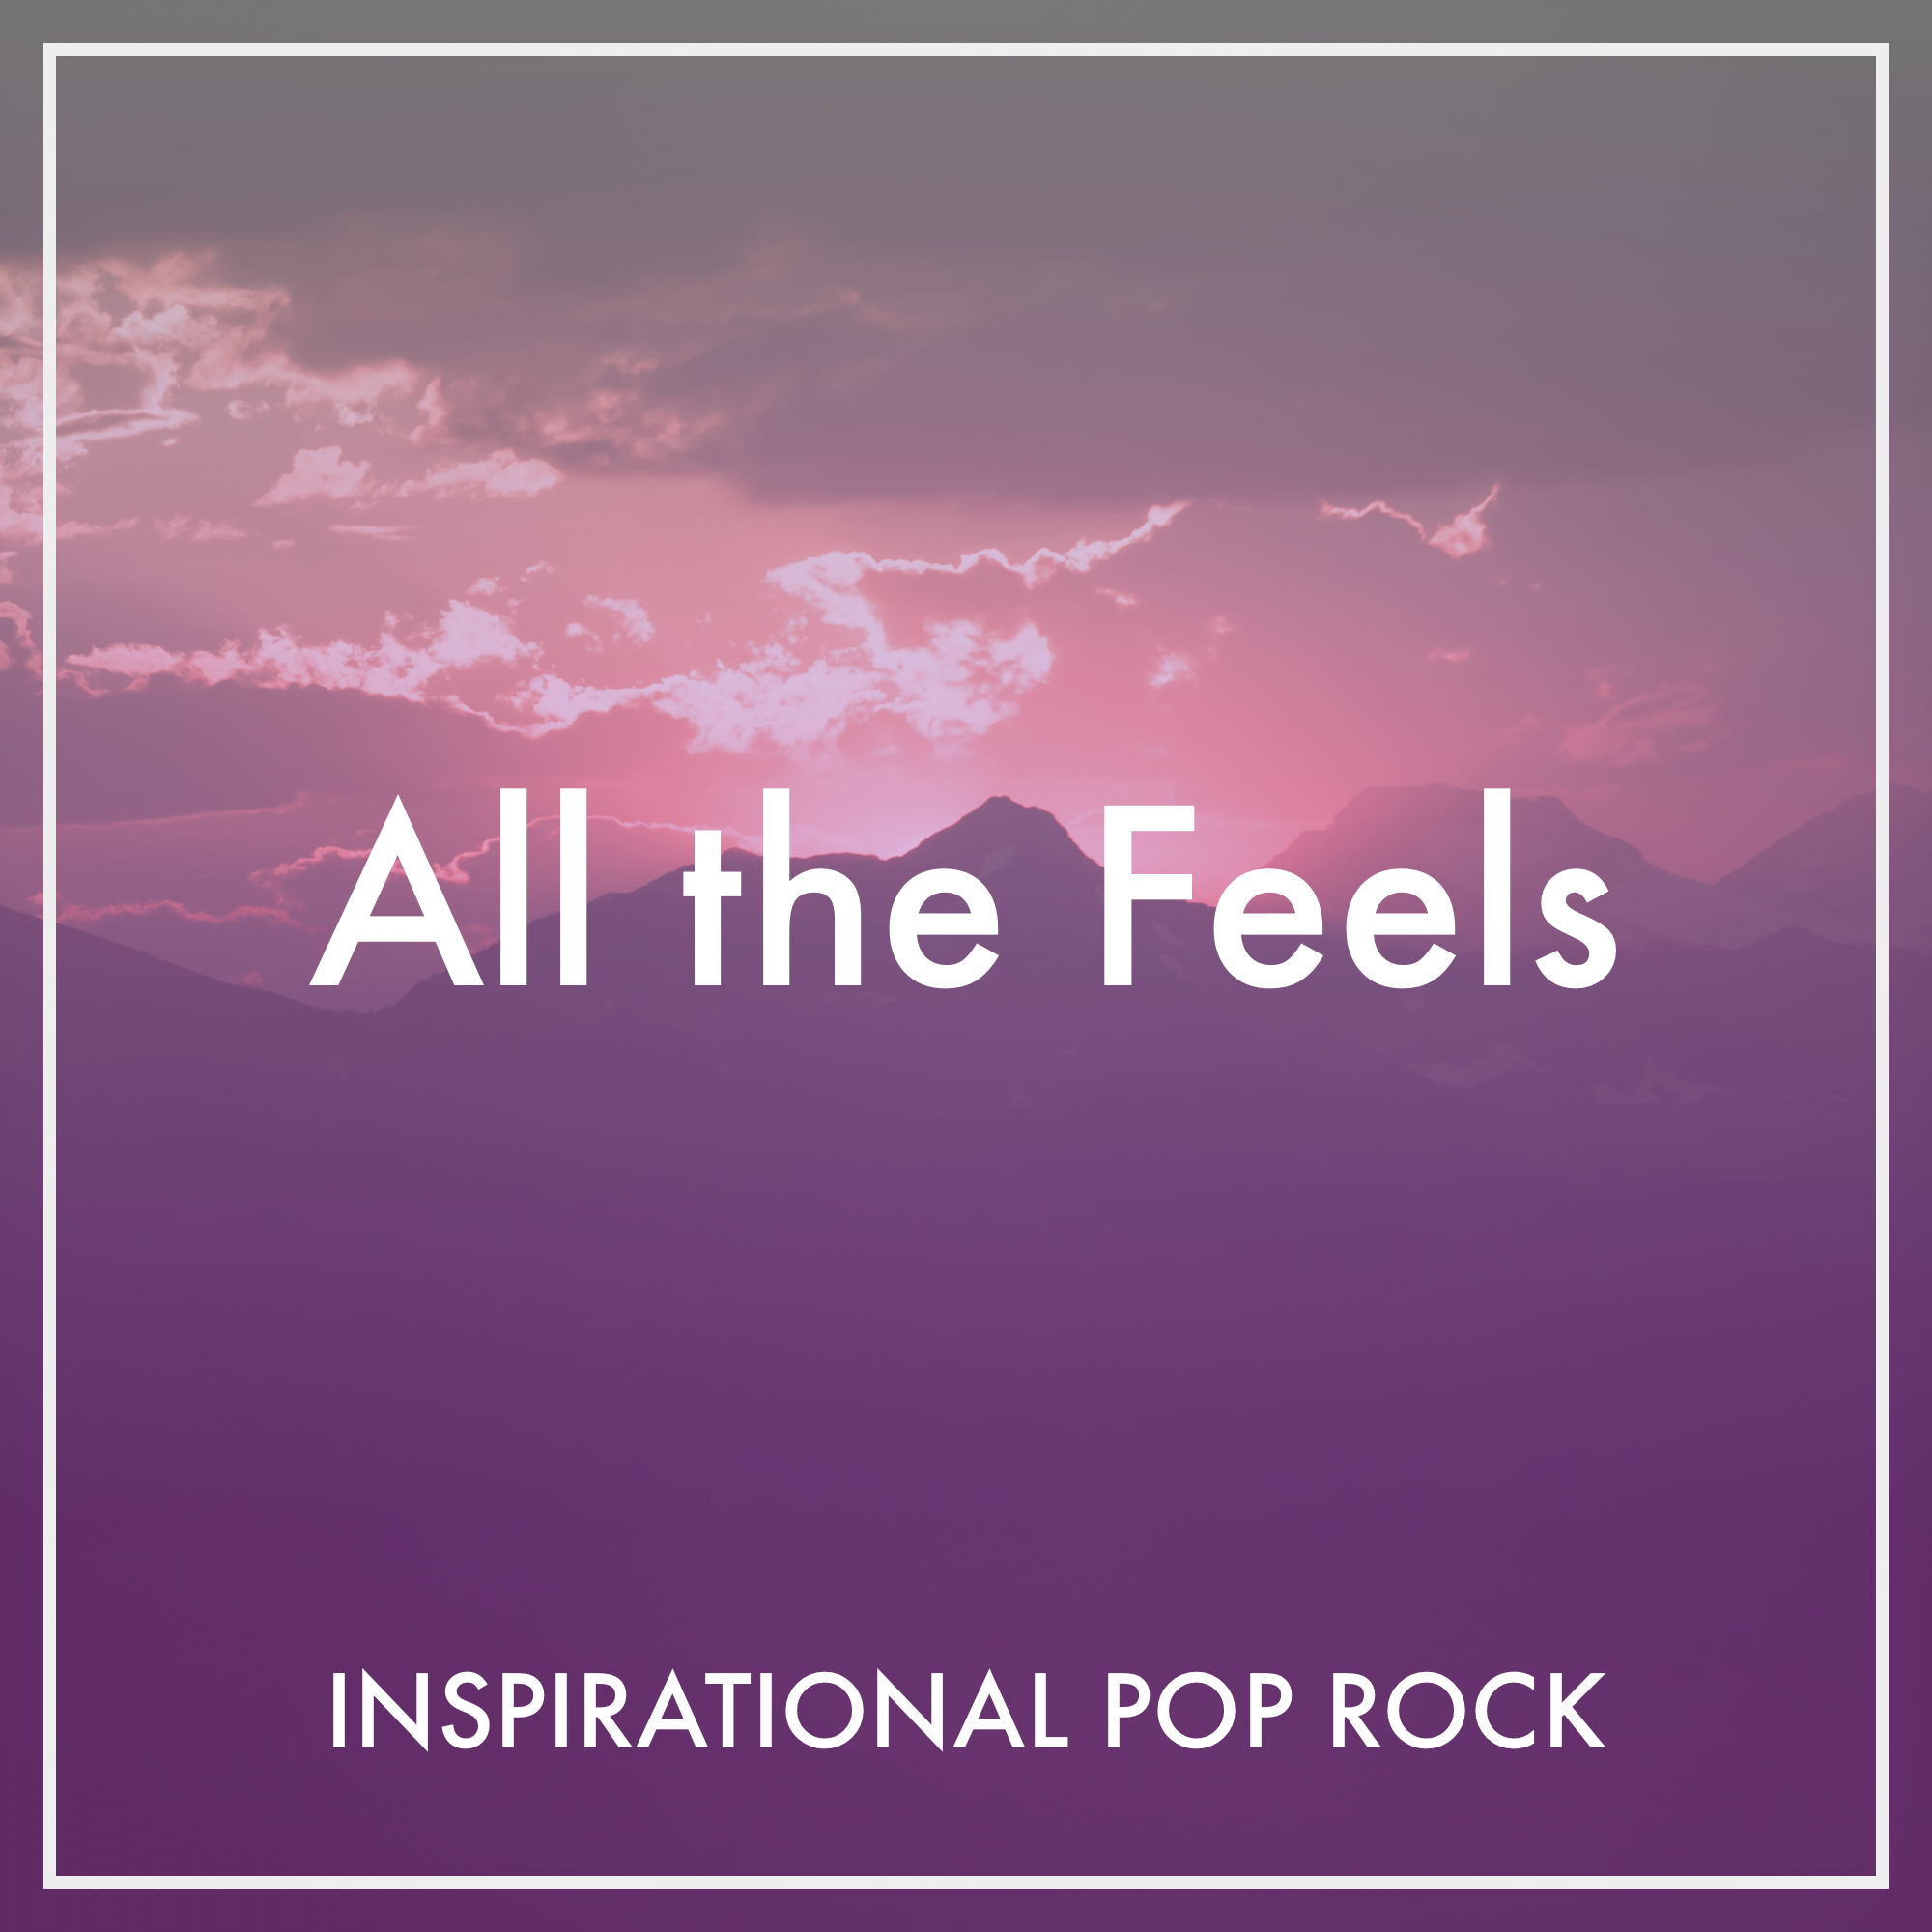 Inspirational Pop Rock by John Coggins